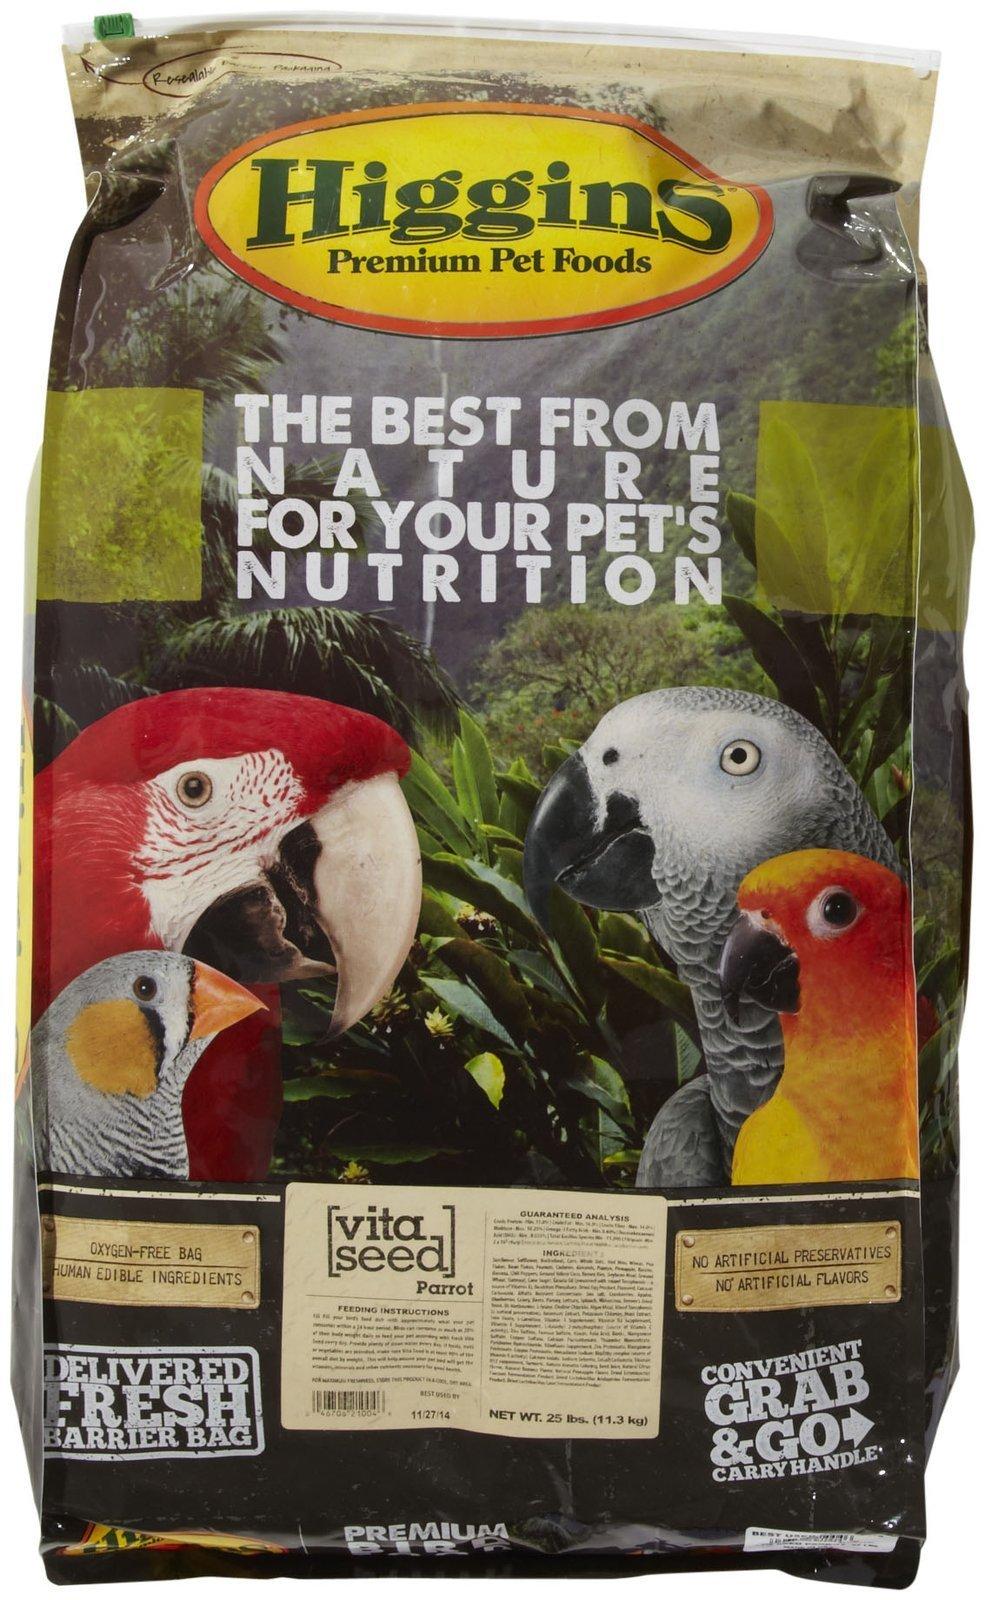 Higgins 466145 Vita Seed Parrot Food For Birds, 25-Pound by Higgins